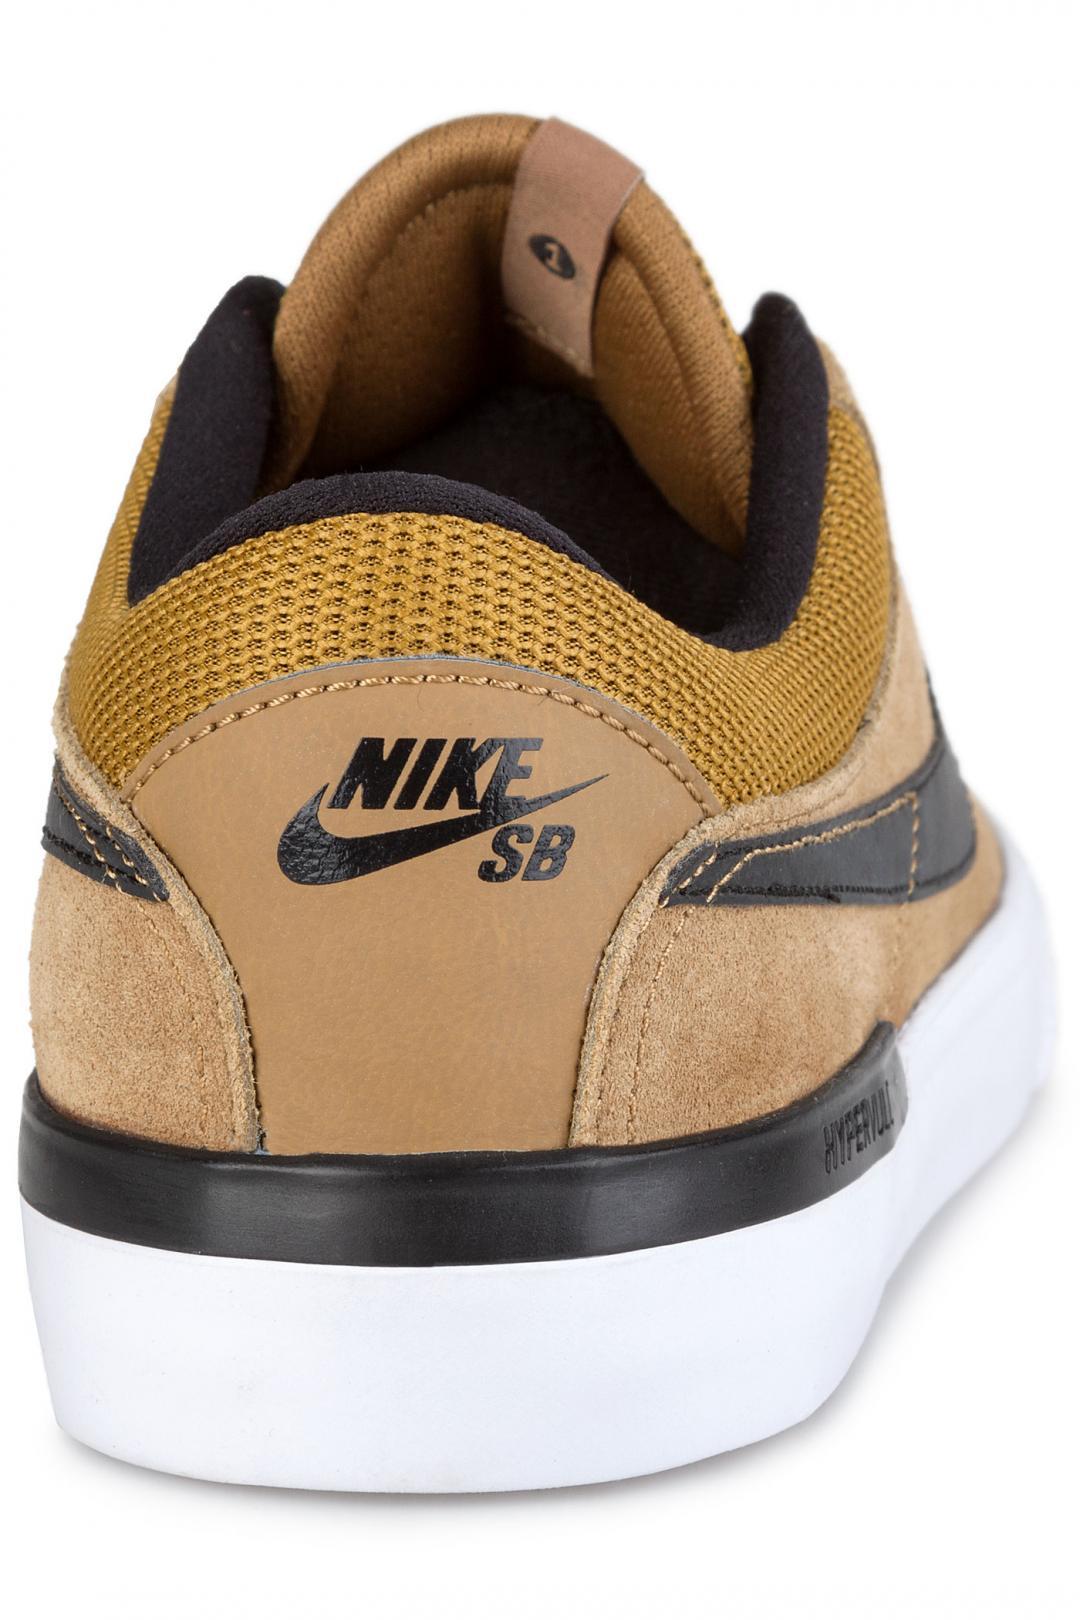 Uomo Nike SB Koston Hypervulc golden beige black | Sneakers low top